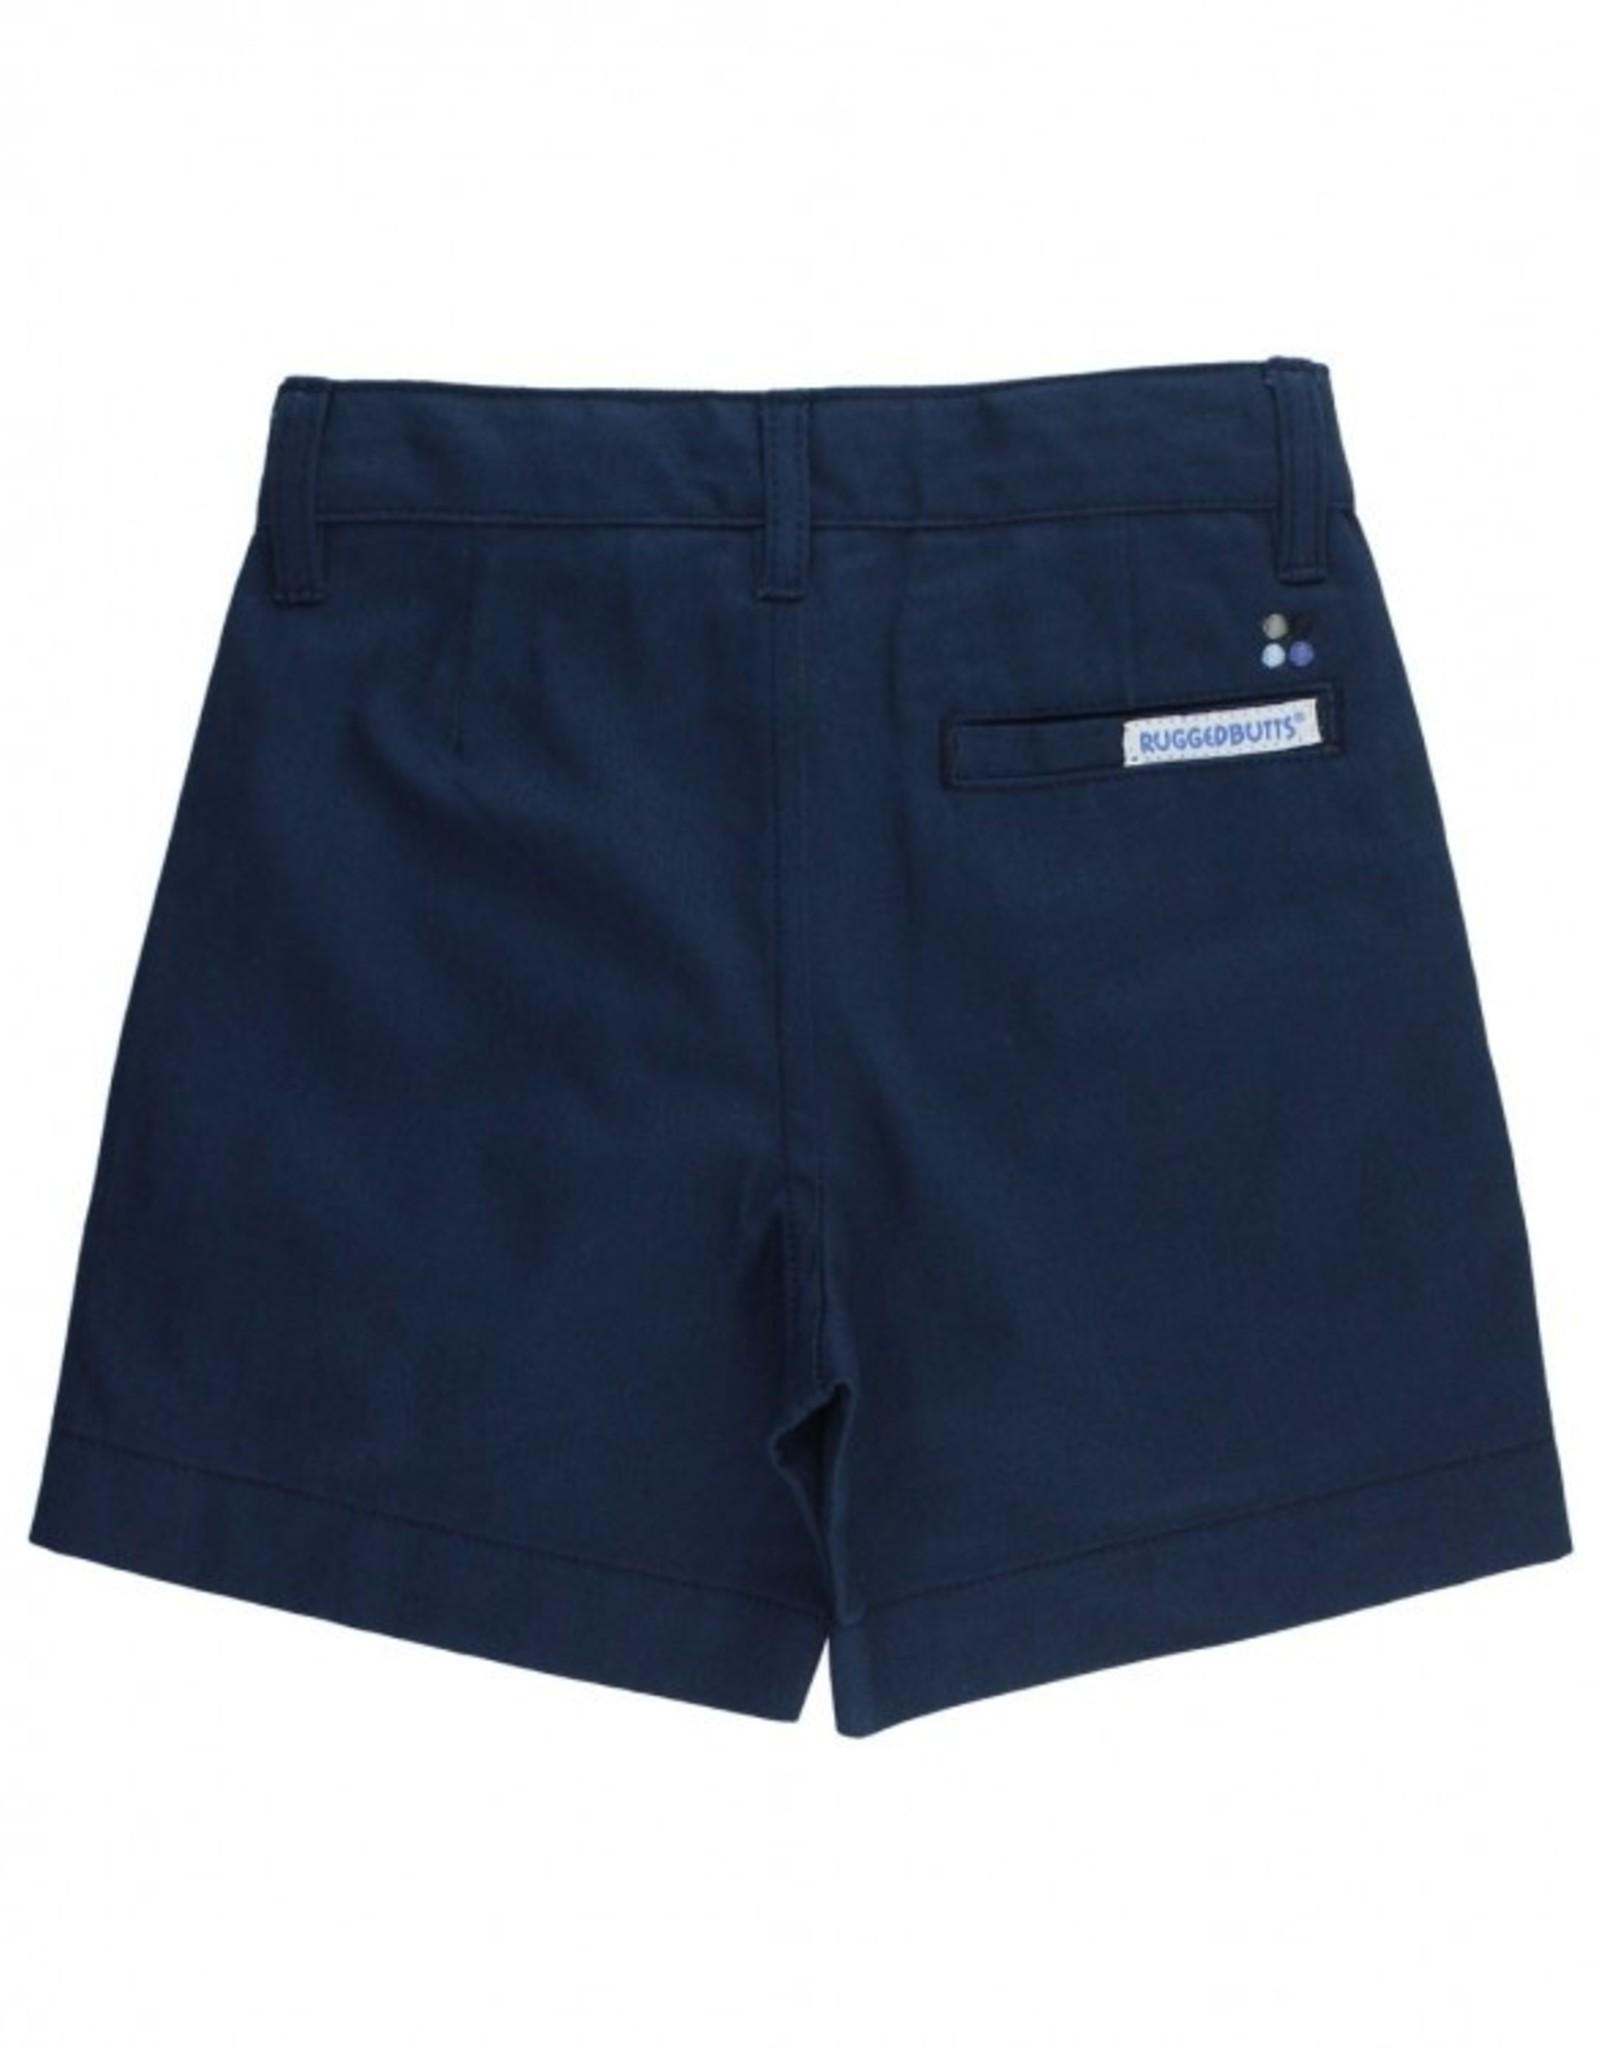 RuggedButts Navy Lightweight Chino Shorts 18-24 months